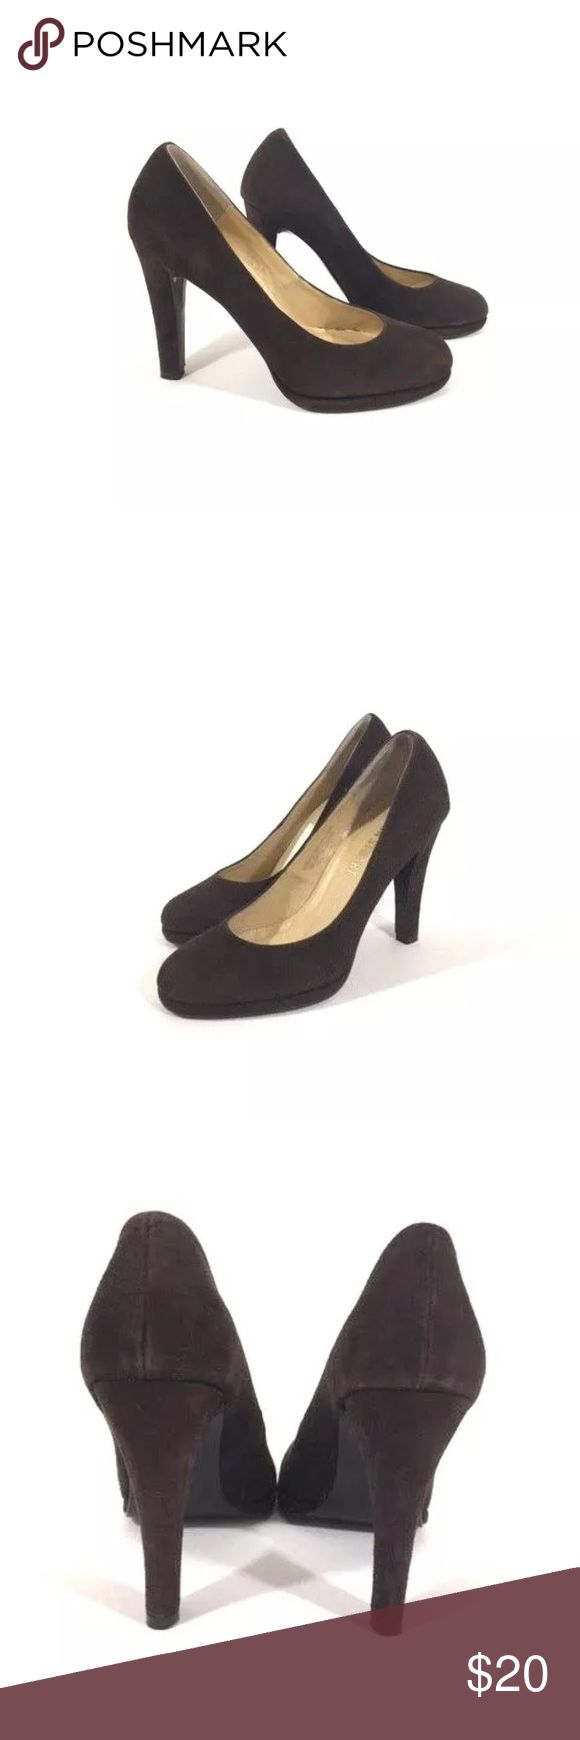 "Colin Stuart Brown Stiletto Women's 4"" Heel Sz 7M Colin Stuart Stiletto Brown Women's 4"" High Heel Shoes Sz 7M Colin Stuart Shoes Heels"